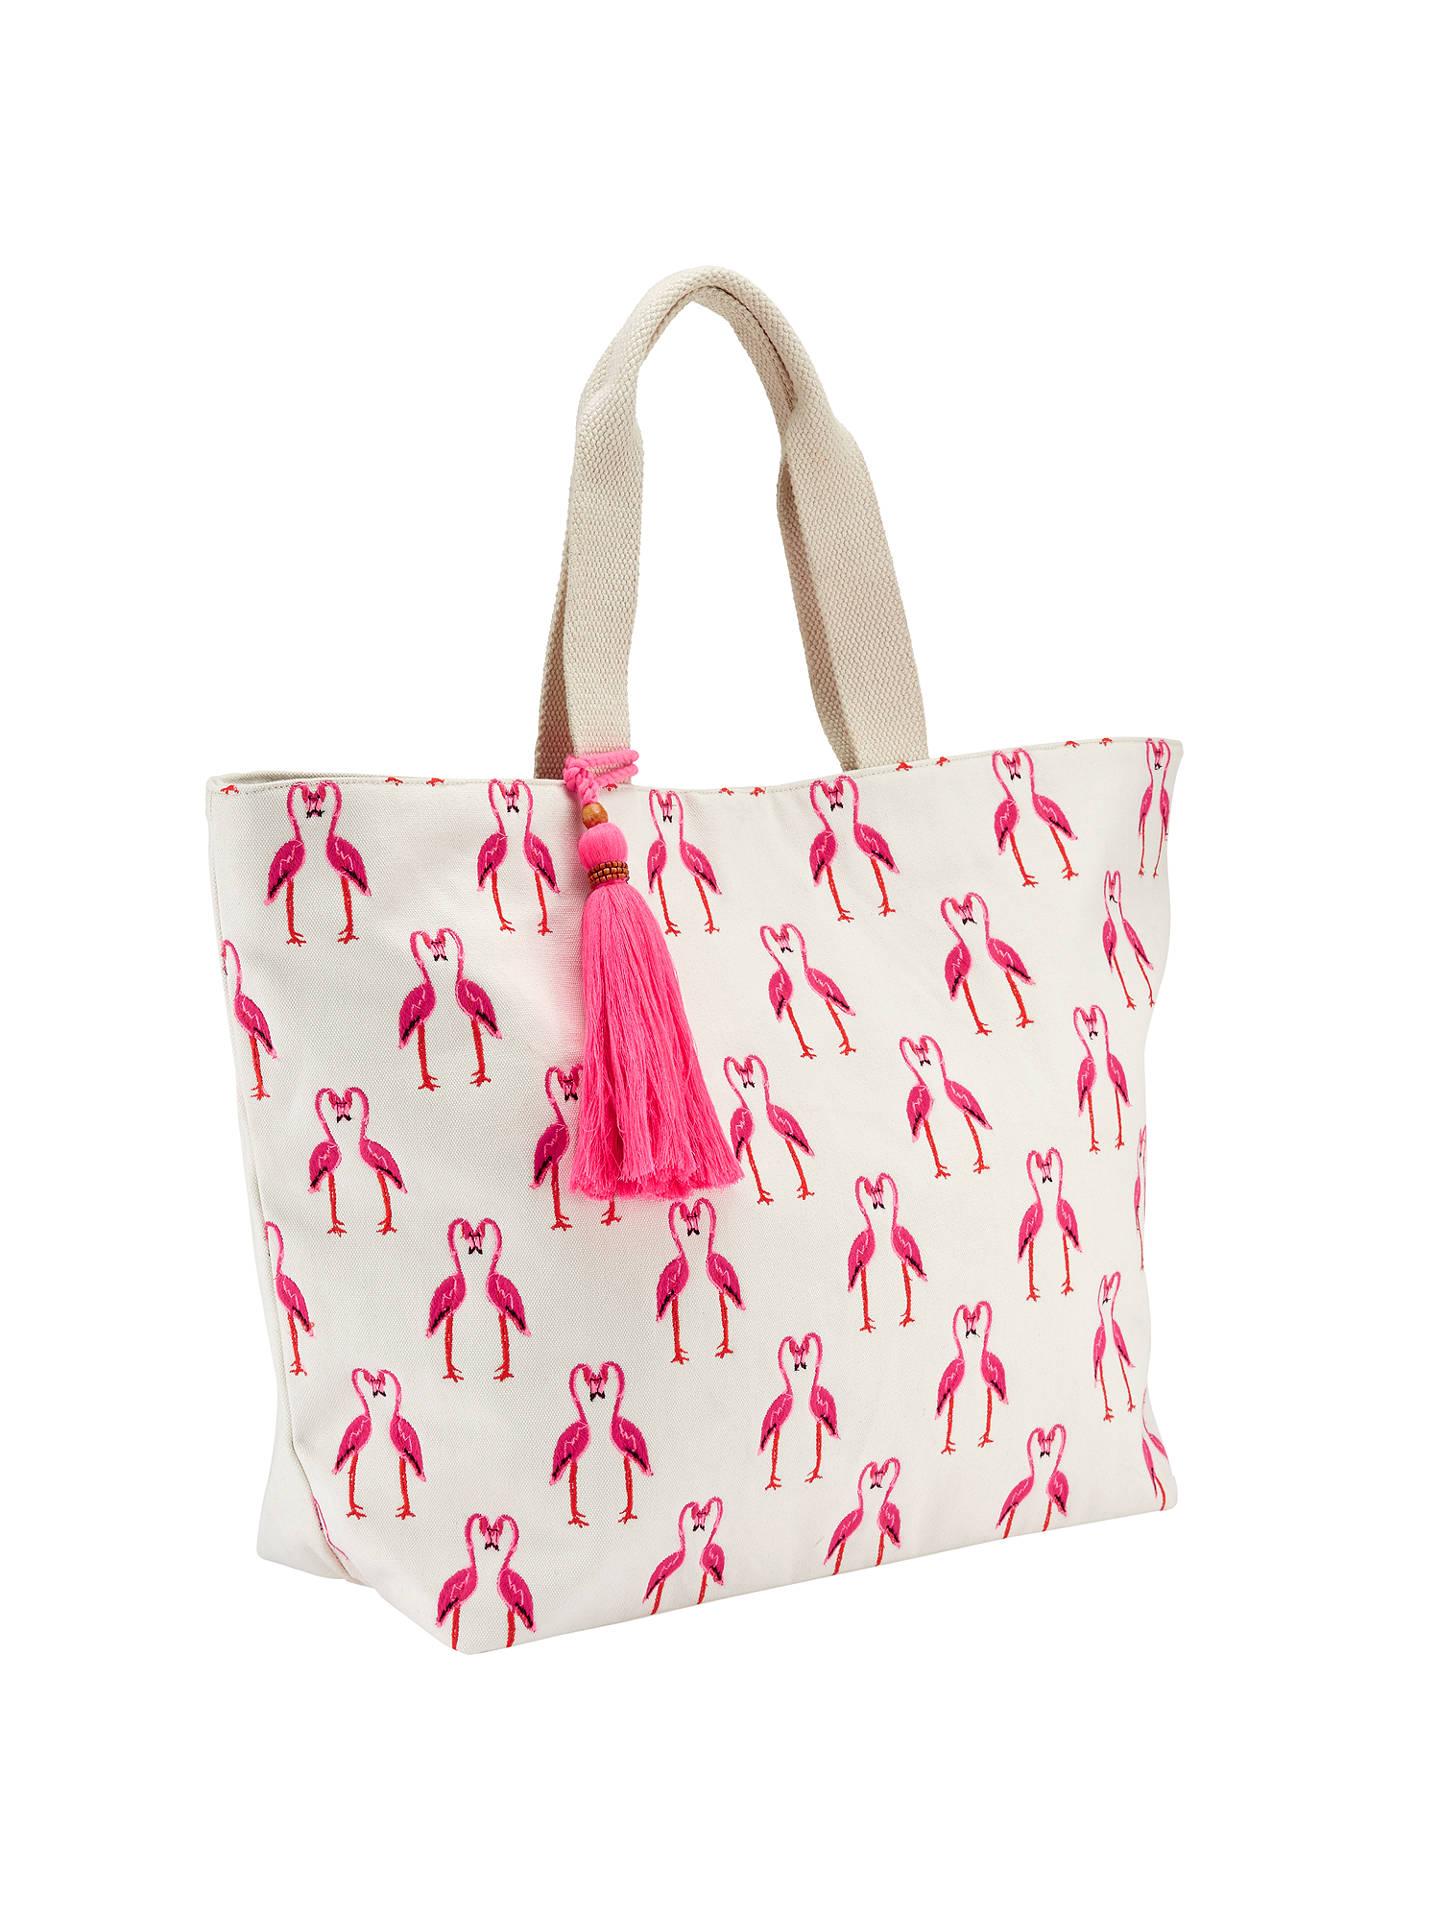 4f5172b1a8bd ... BuyJohn Lewis Flamingo Canvas Tote Bag